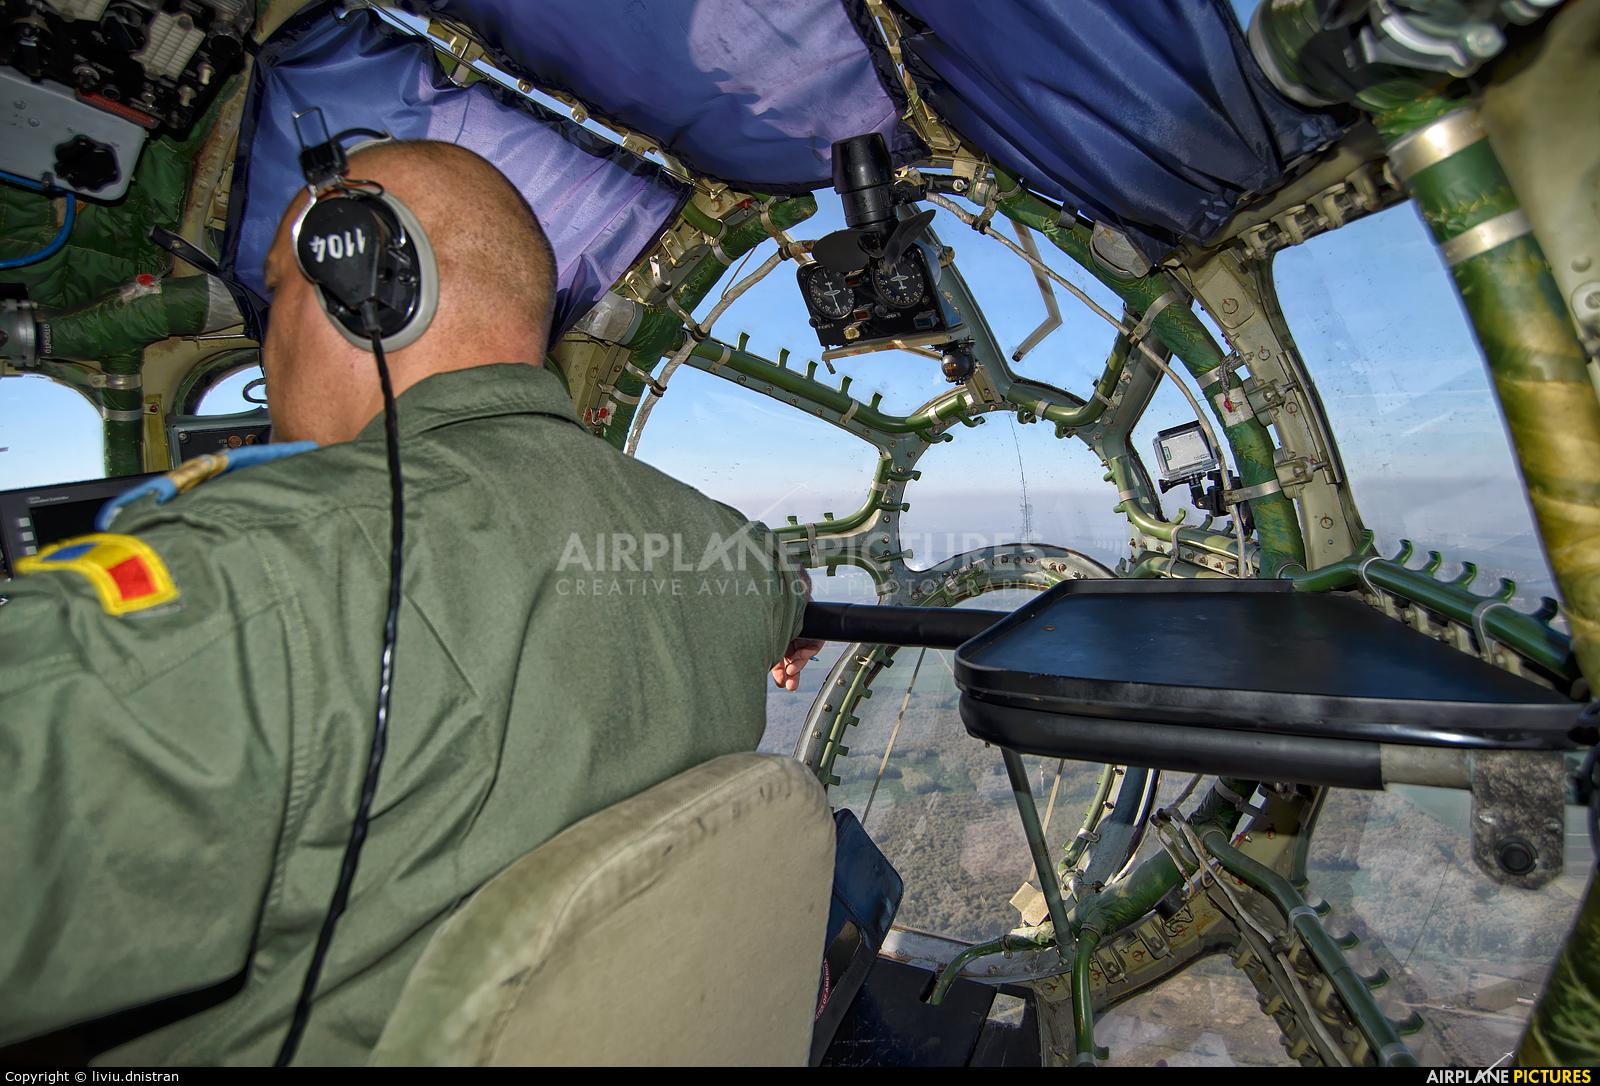 Romania - Air Force 1104 aircraft at Off Airport - Romania